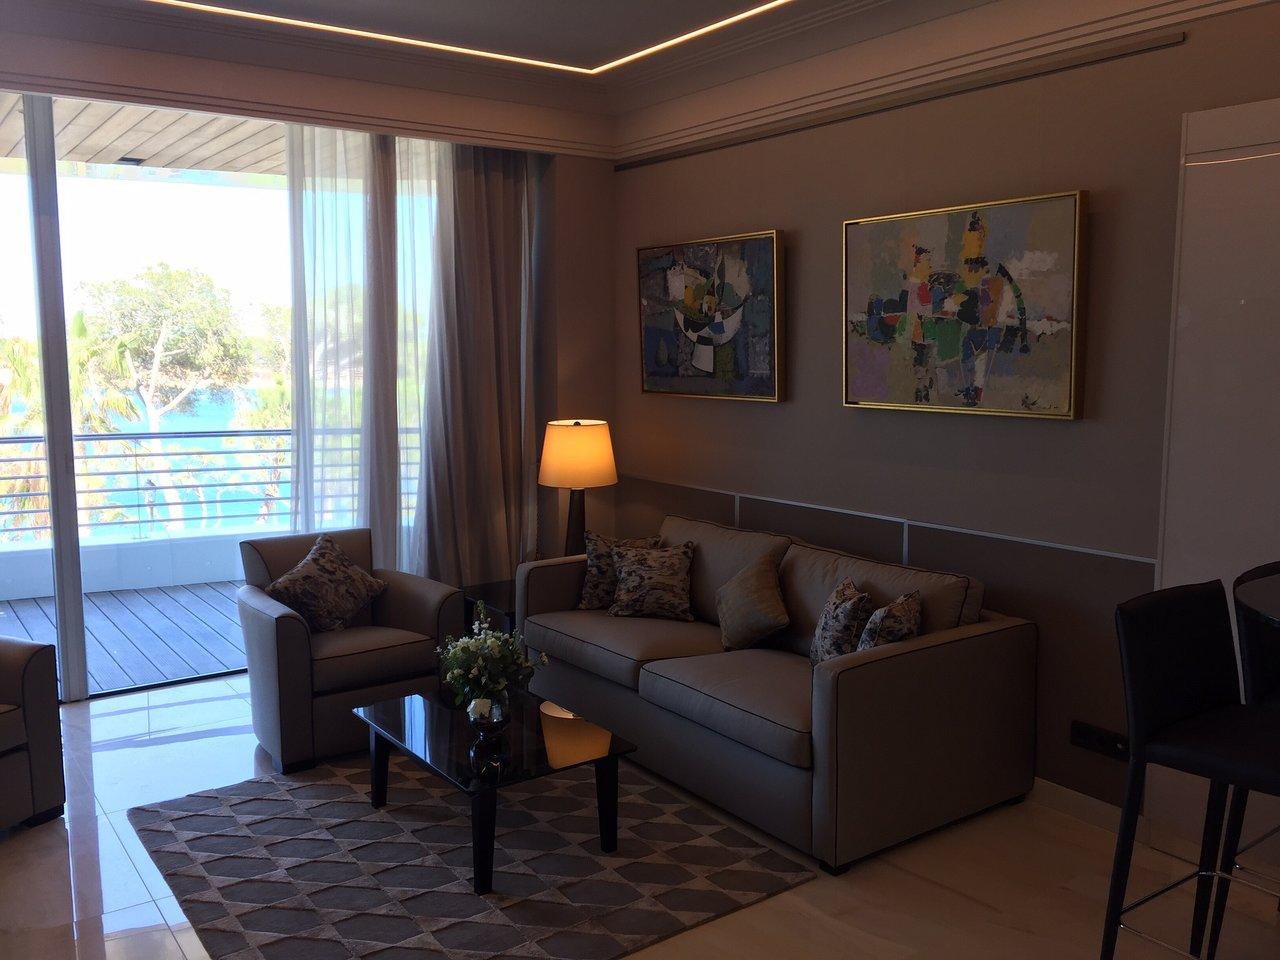 ALABRIGA HOTEL   HOME SUITES 5  GL - UPDATED 2018 Reviews   Price  Comparison (Sant Feliu de Guixols 6c1b5b2f33